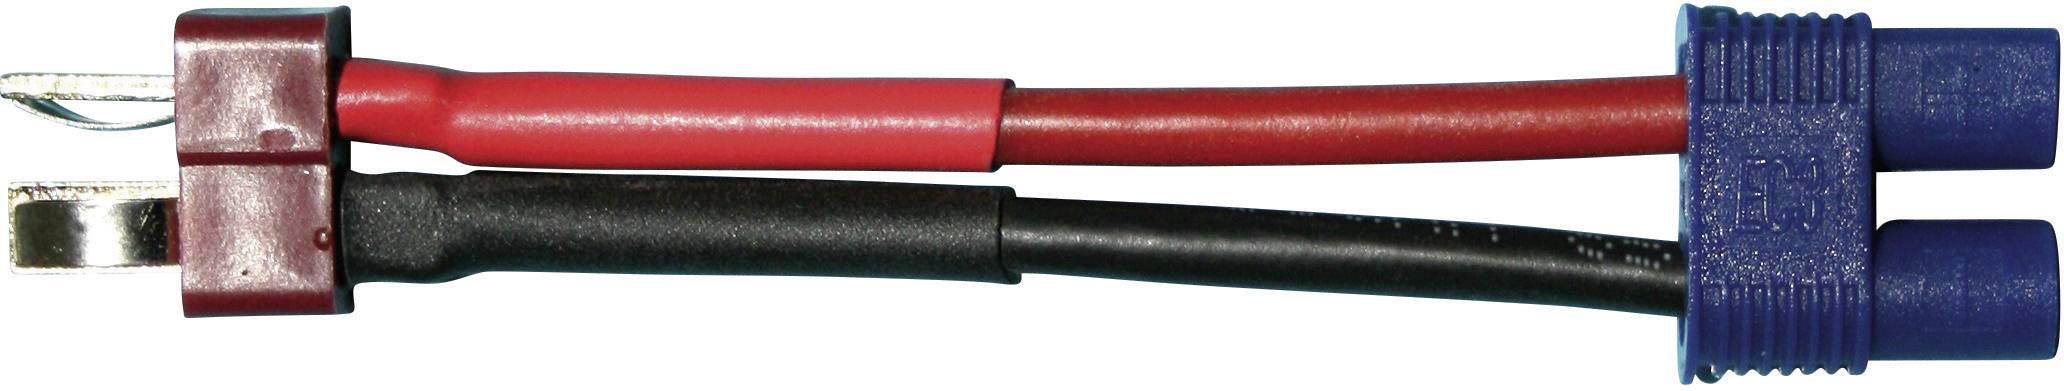 Redukce Modelcraft T zástrčka/ EC3 zásuvka, 100 mm, 2,5 mm²